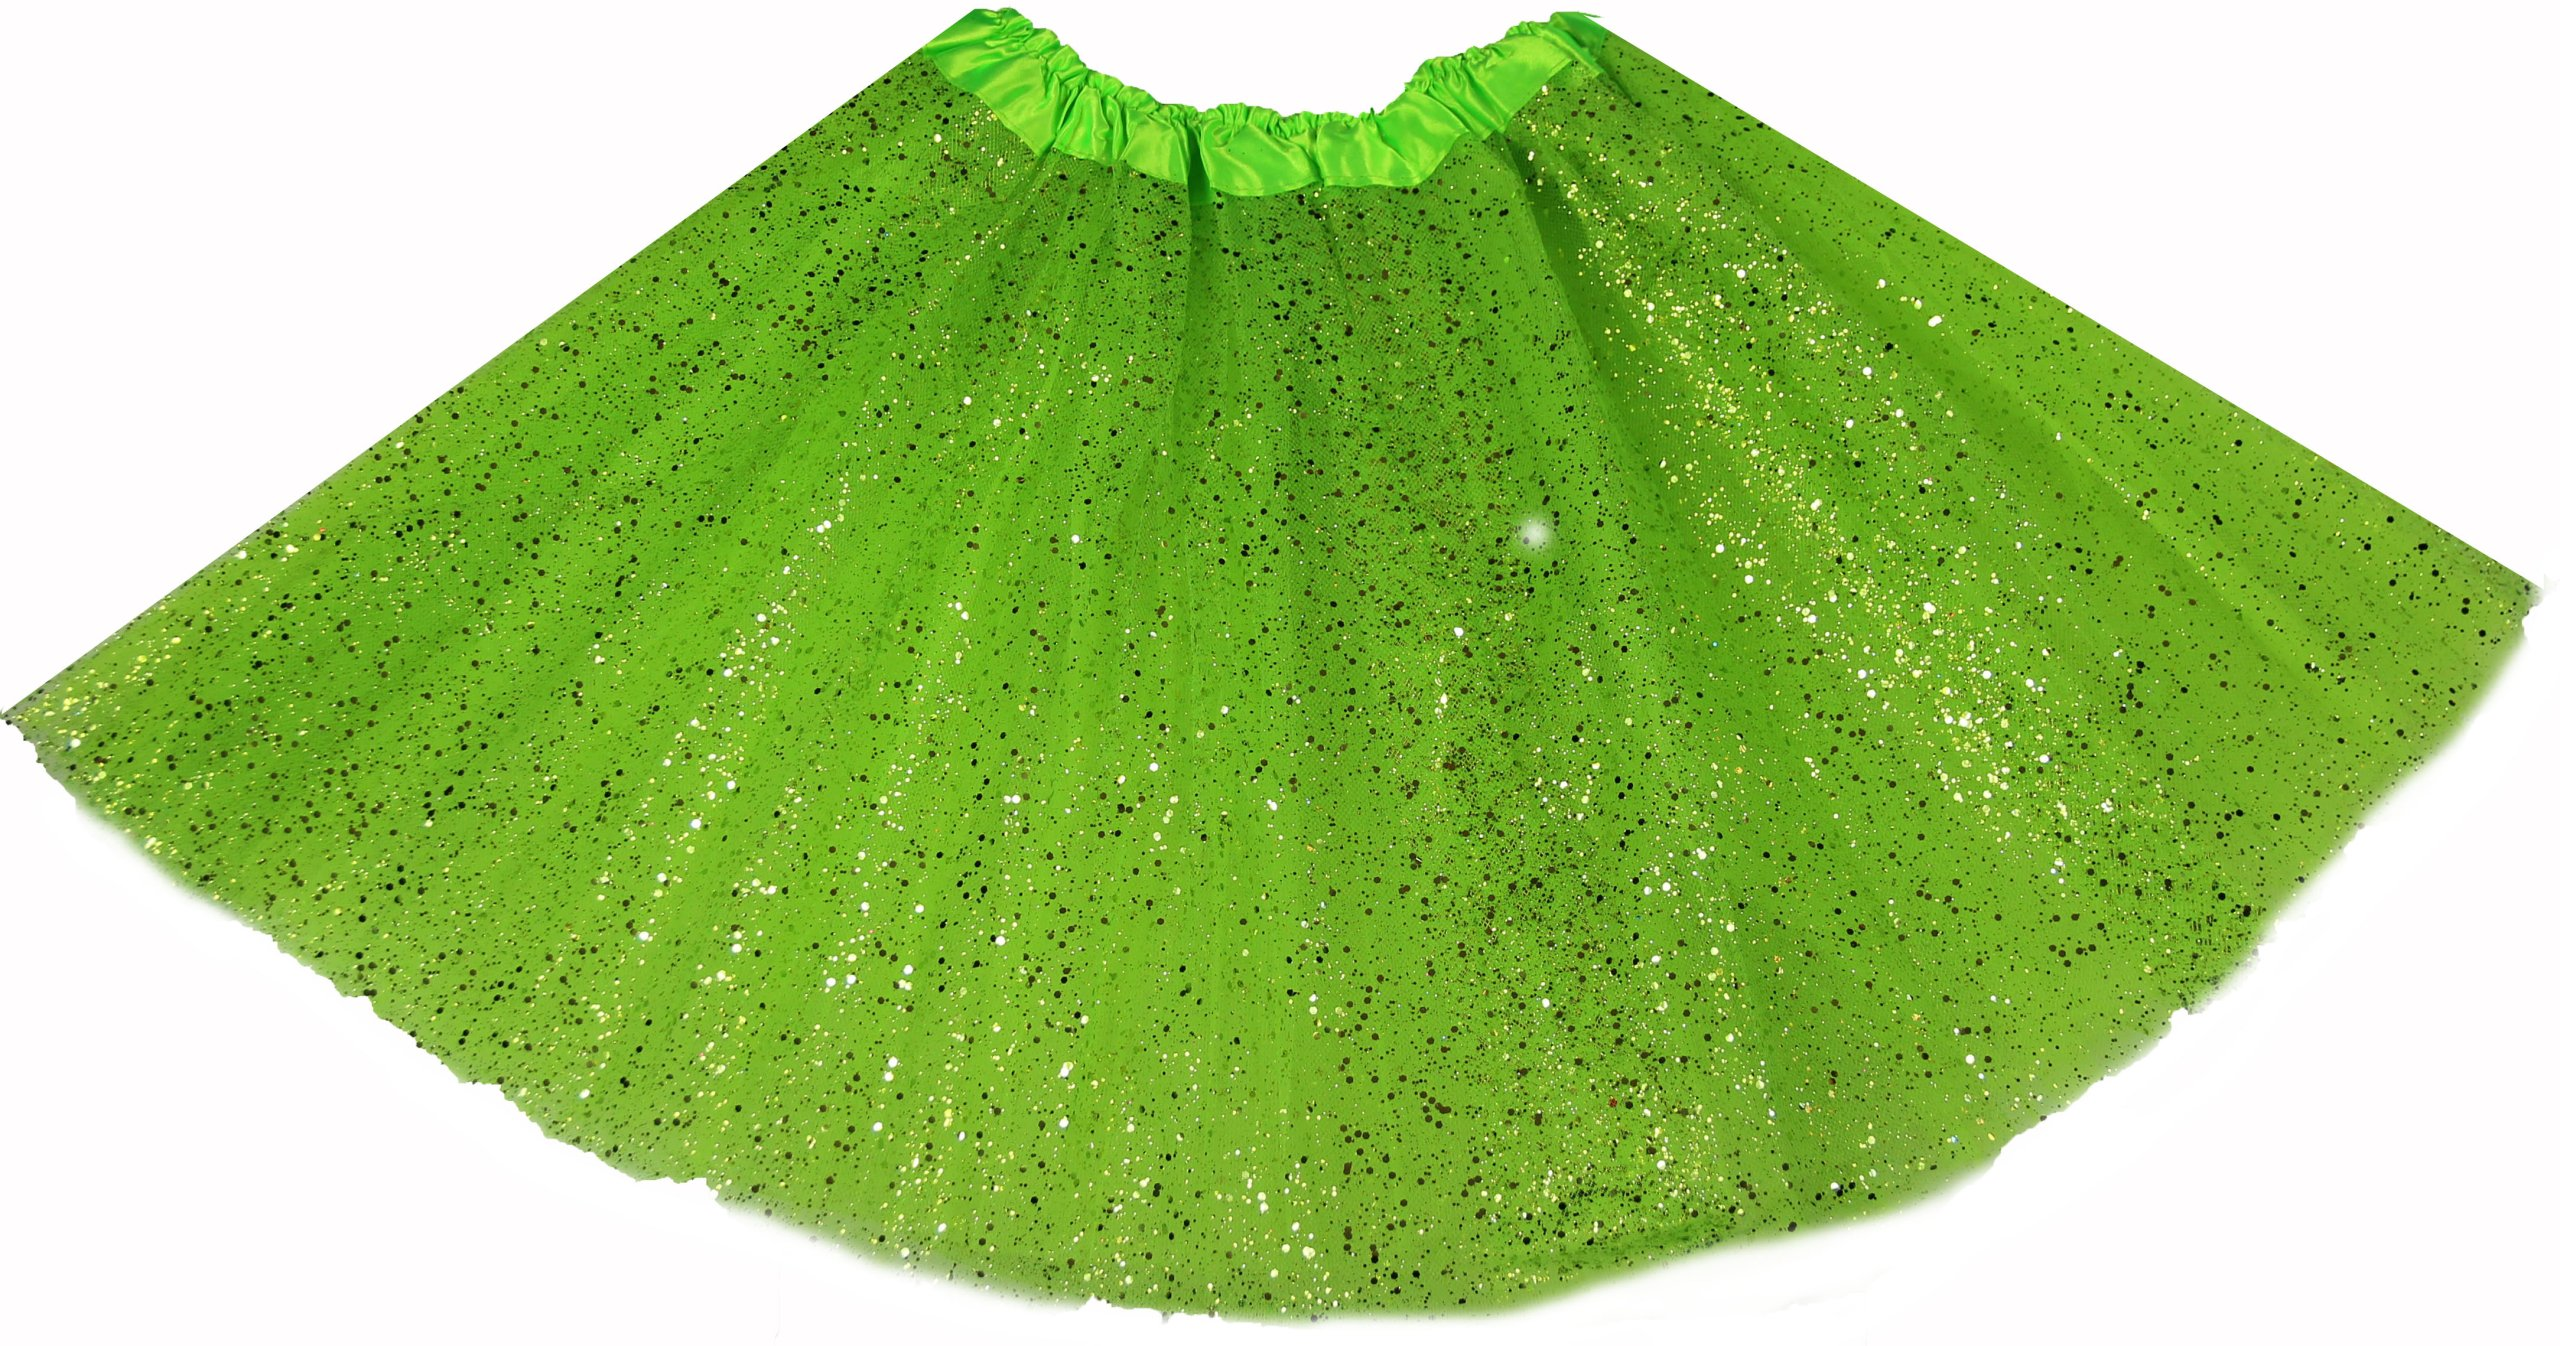 7d61a4b8e8 TIULOWA TUTU SPÓDNICA zielona brokat 40 CM 7340500900 - Allegro.pl